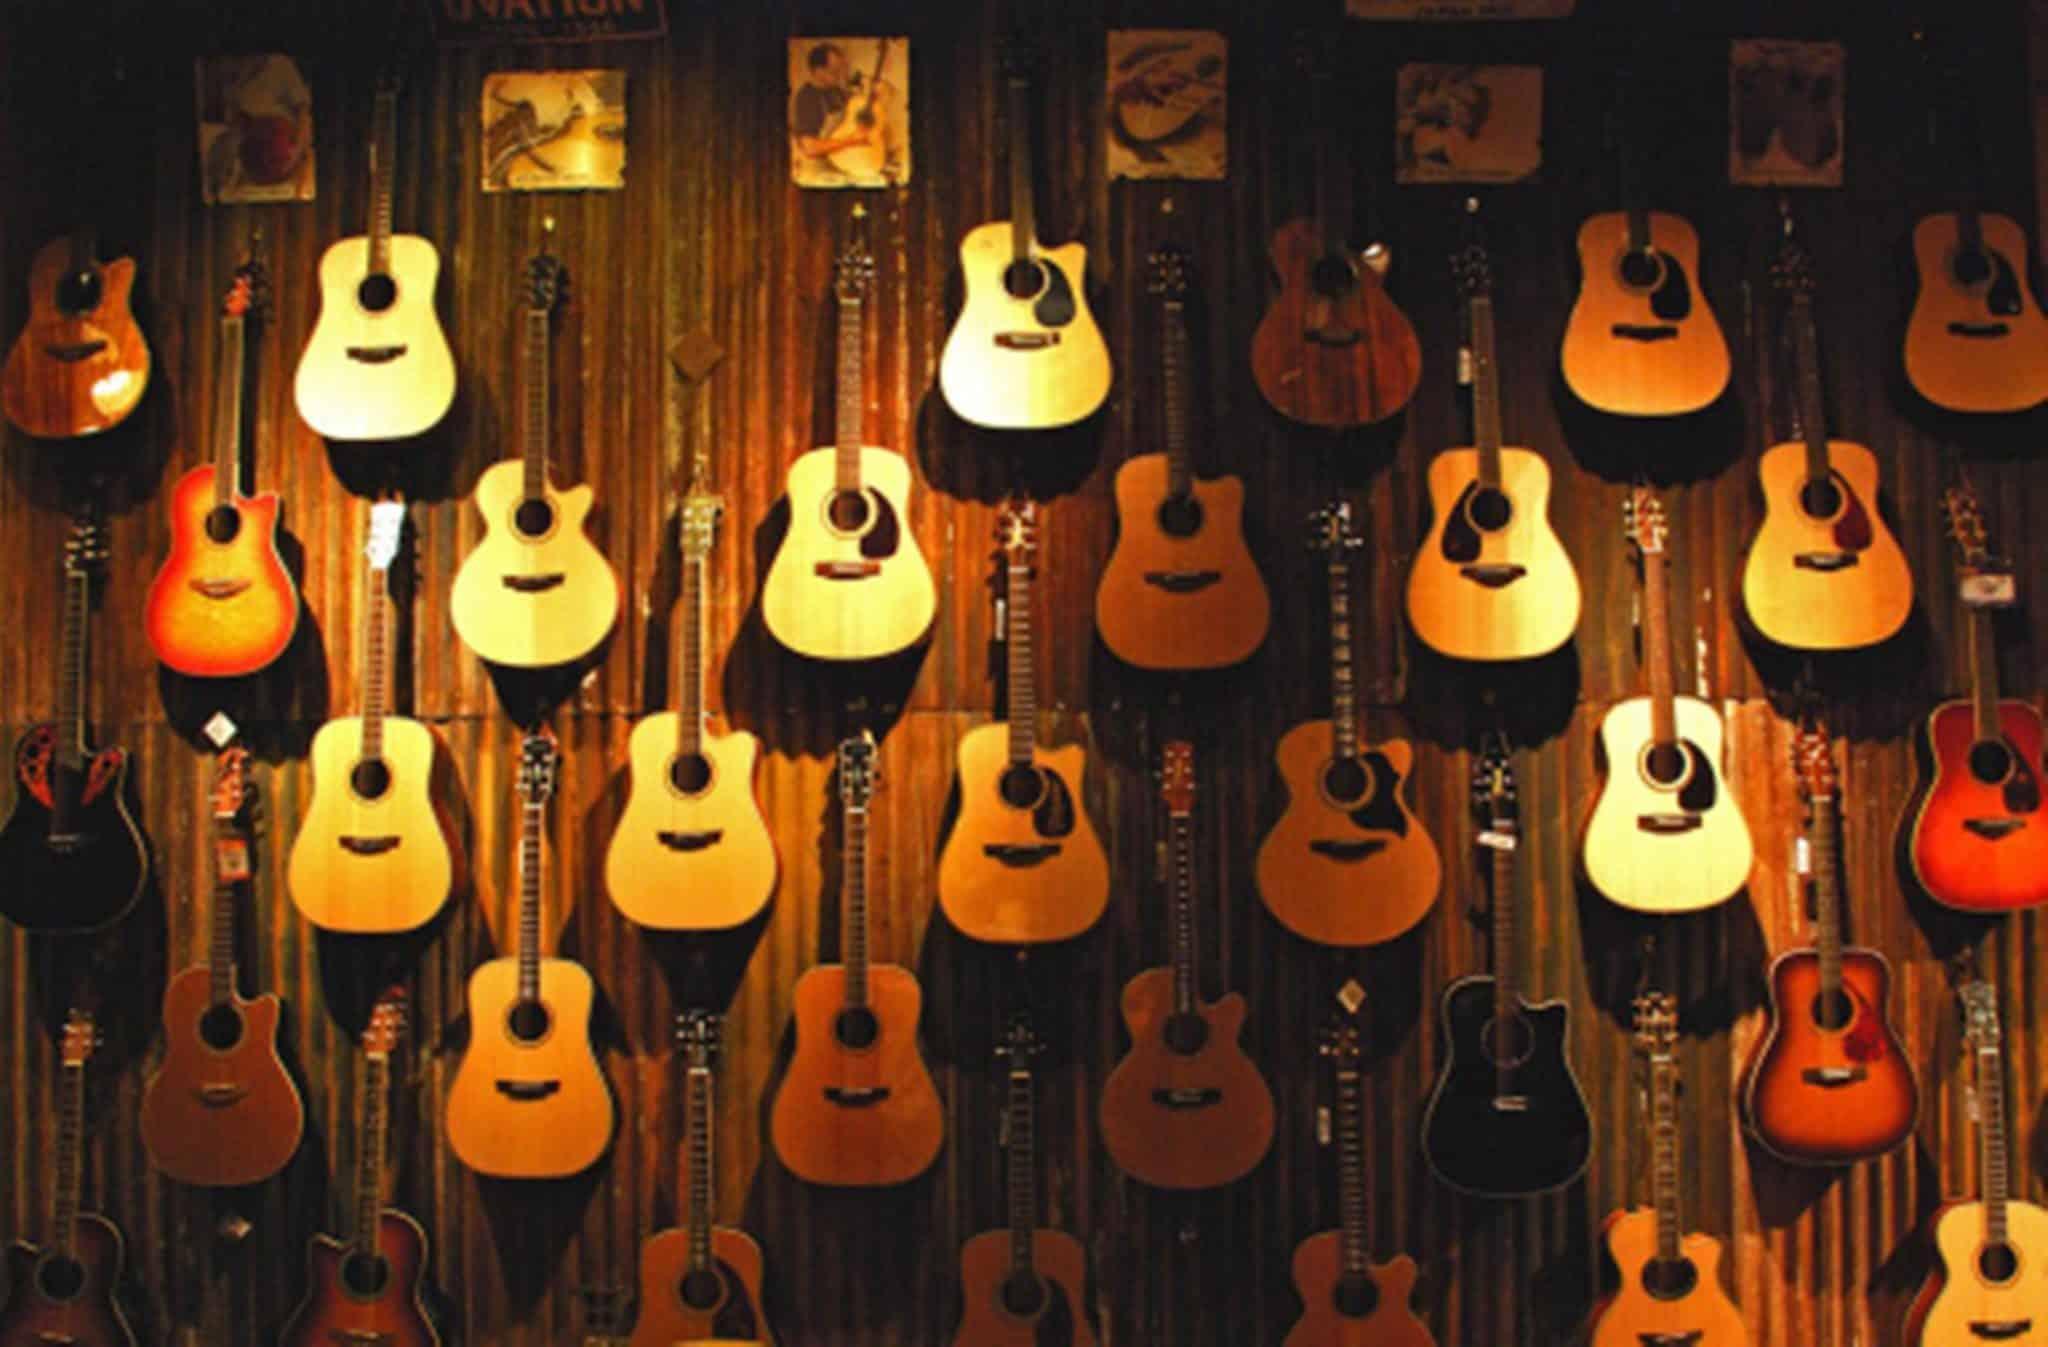 best acoustic electric guitars 2018